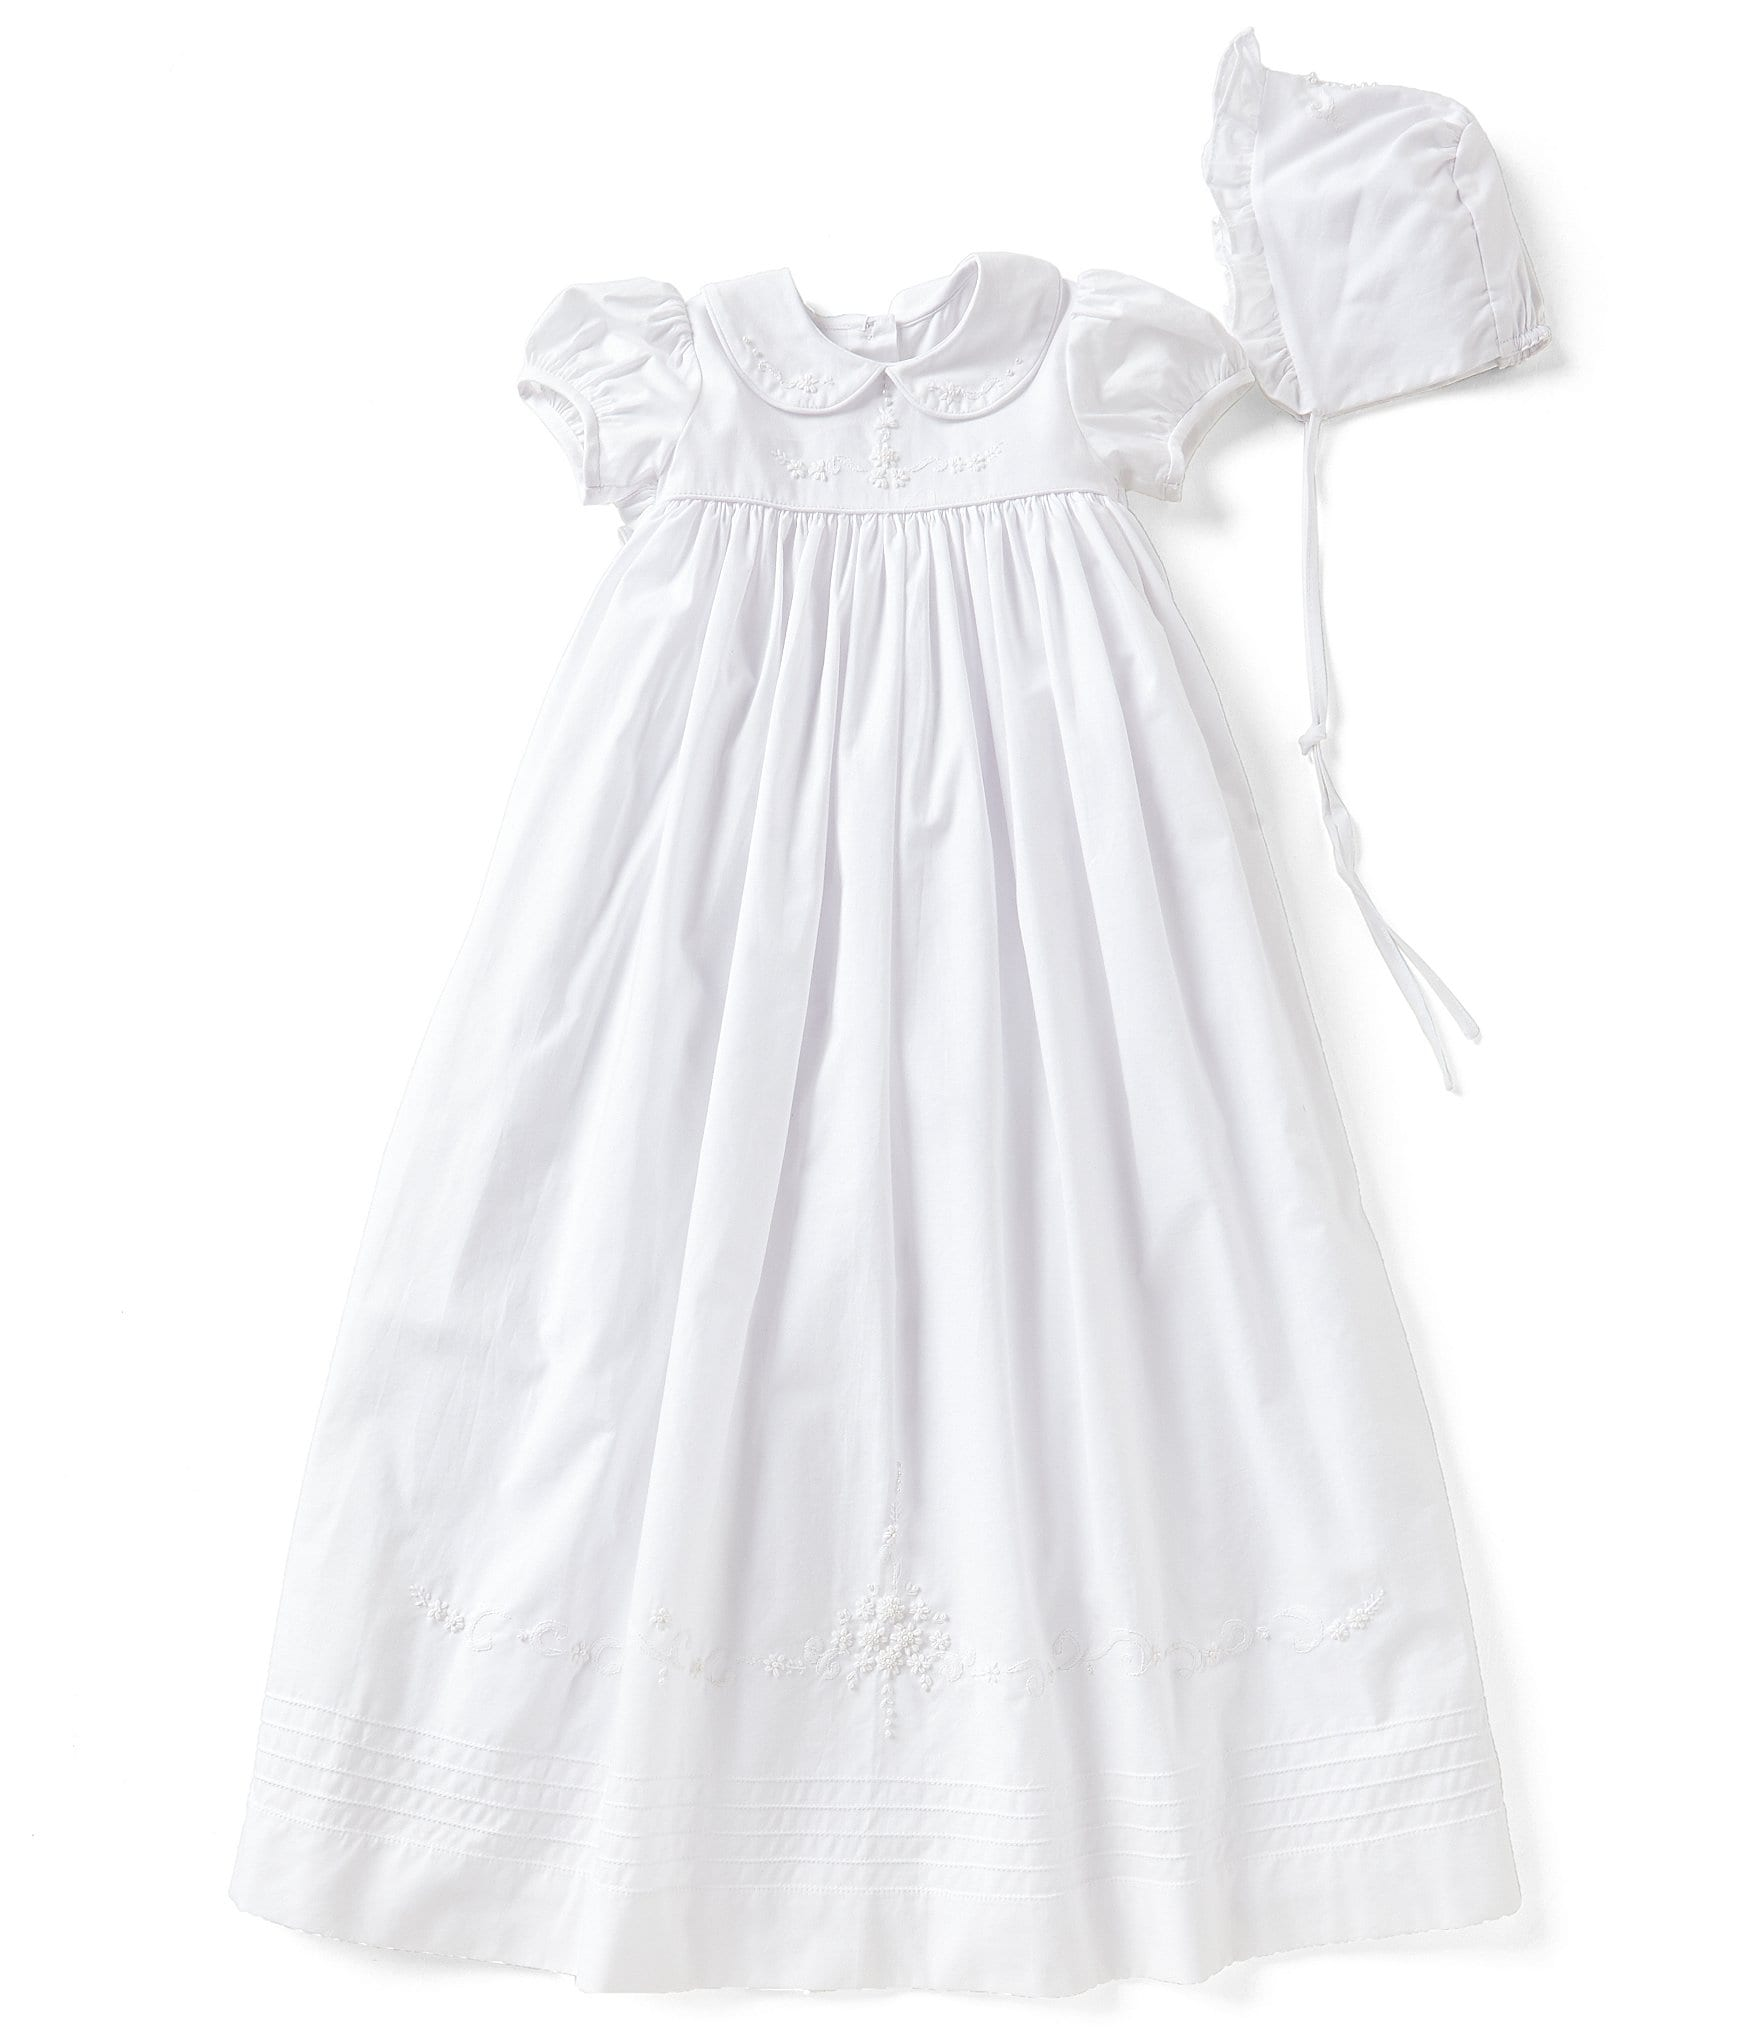 promo code f528e c9ecc baby christmas dress party children clothing ...